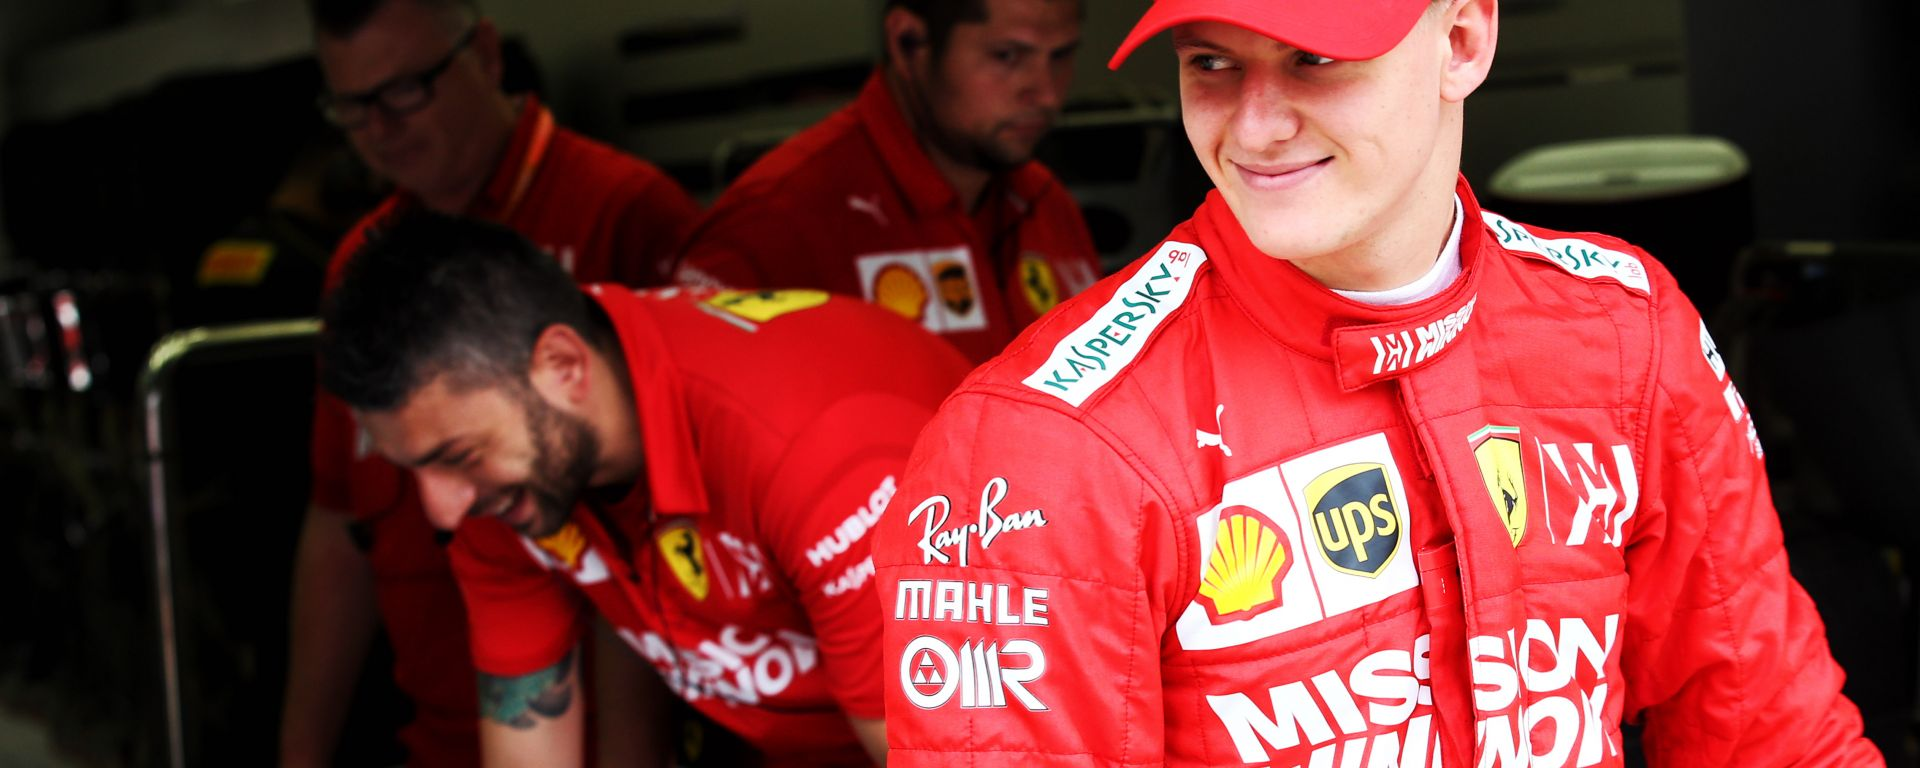 F1 in-season test 2019 Sakhir: Mick Schumacher (Scuderia Ferrari)